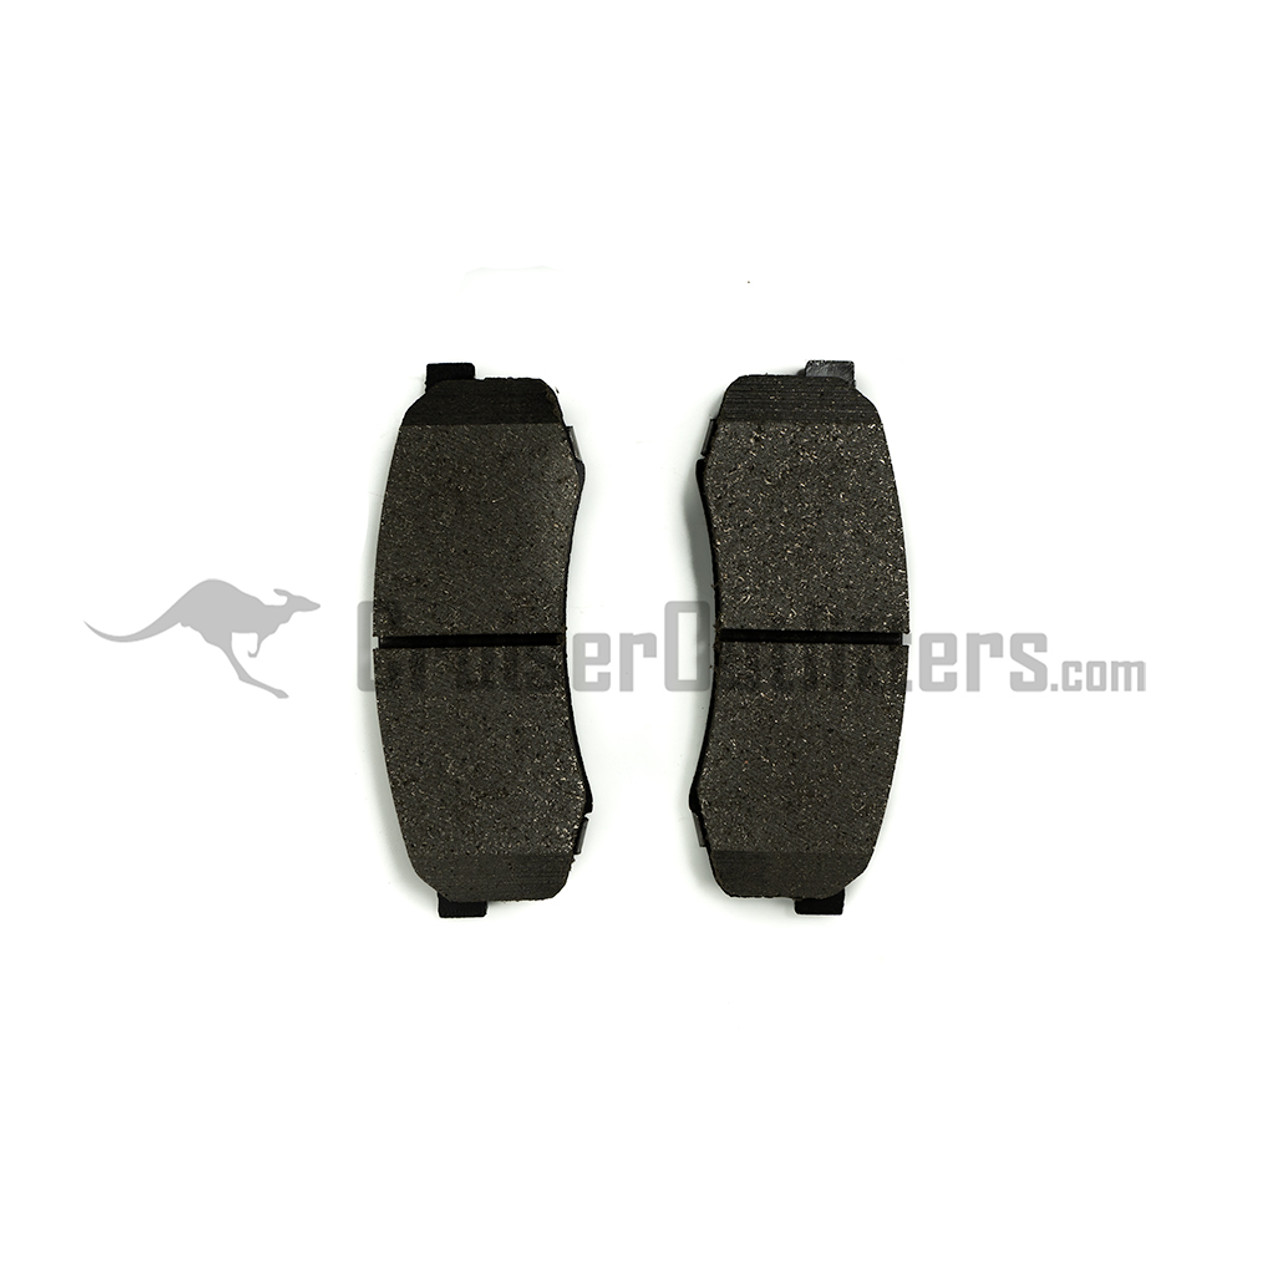 BRAD0606 - Fits 1993 - 1/1998 80 Series w/ Rear Disc Brake (ADVICS)